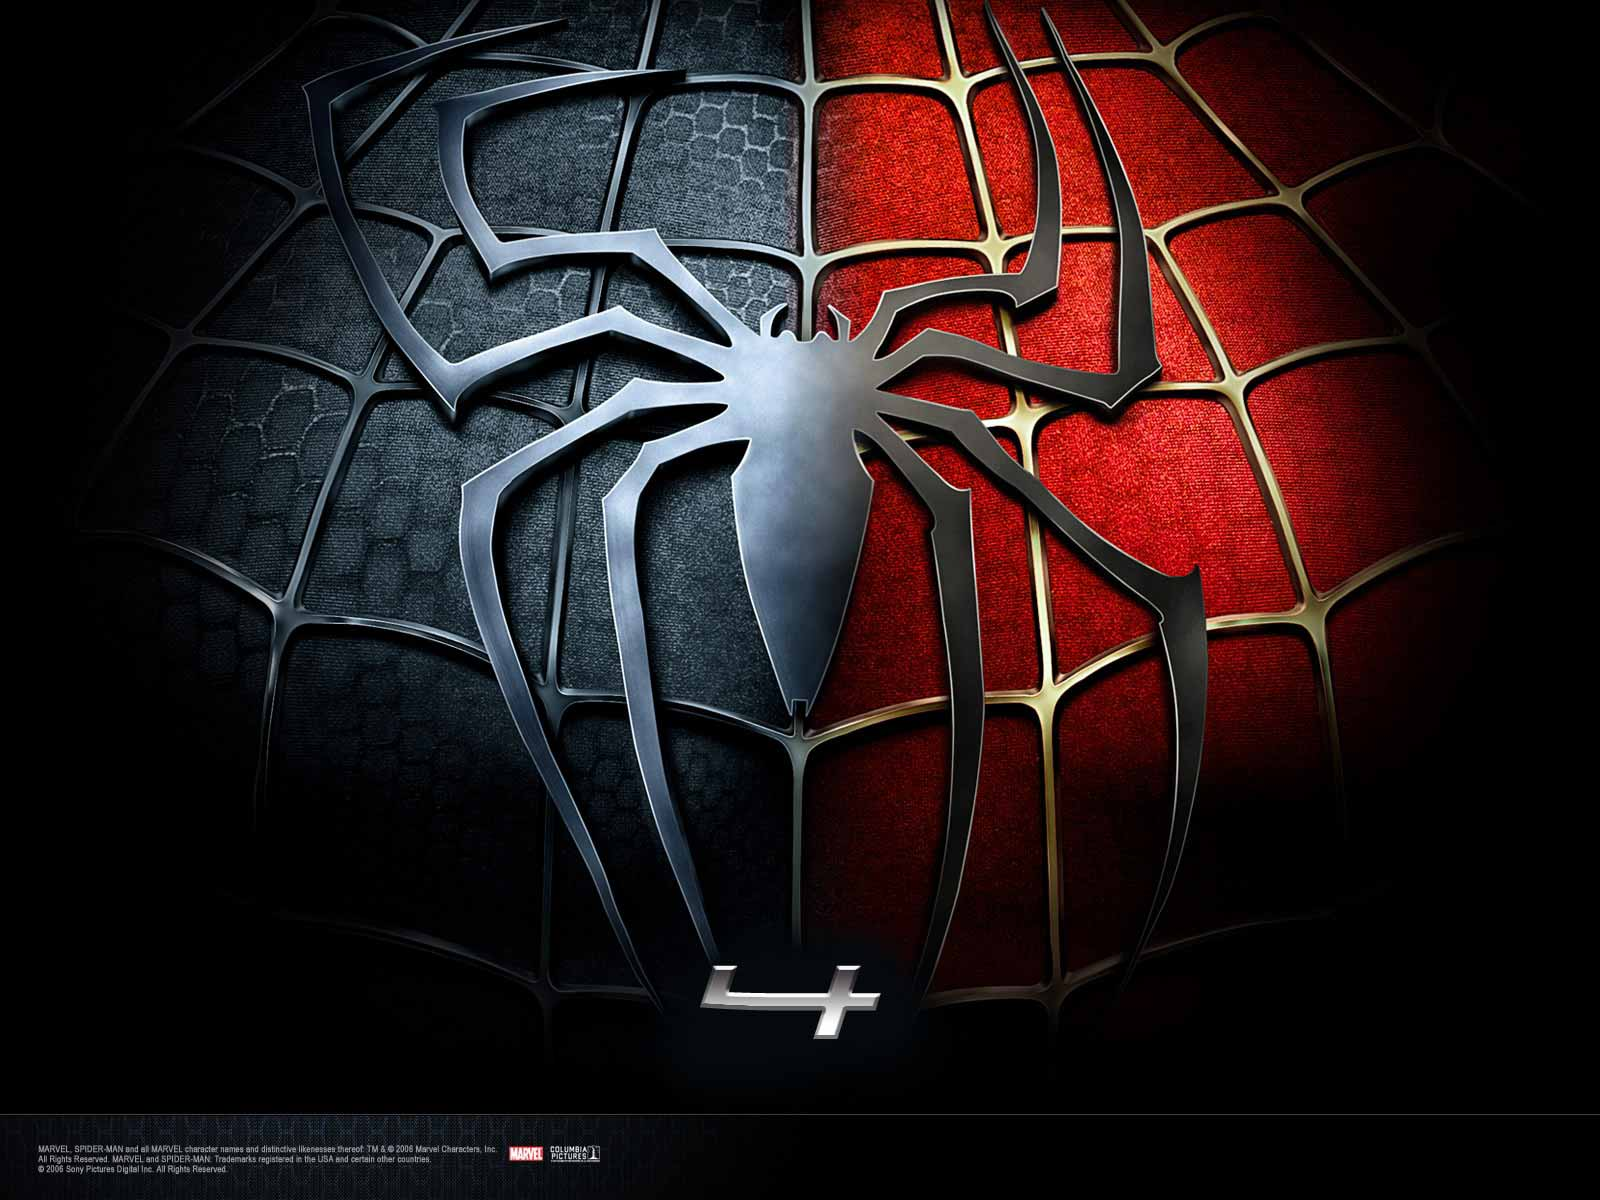 http://2.bp.blogspot.com/-Ma1go_1lU3Y/T67ADAO3vUI/AAAAAAAAAwo/mAJzDi9QZZs/s1600/spiderman+4+wallpaper.jpeg